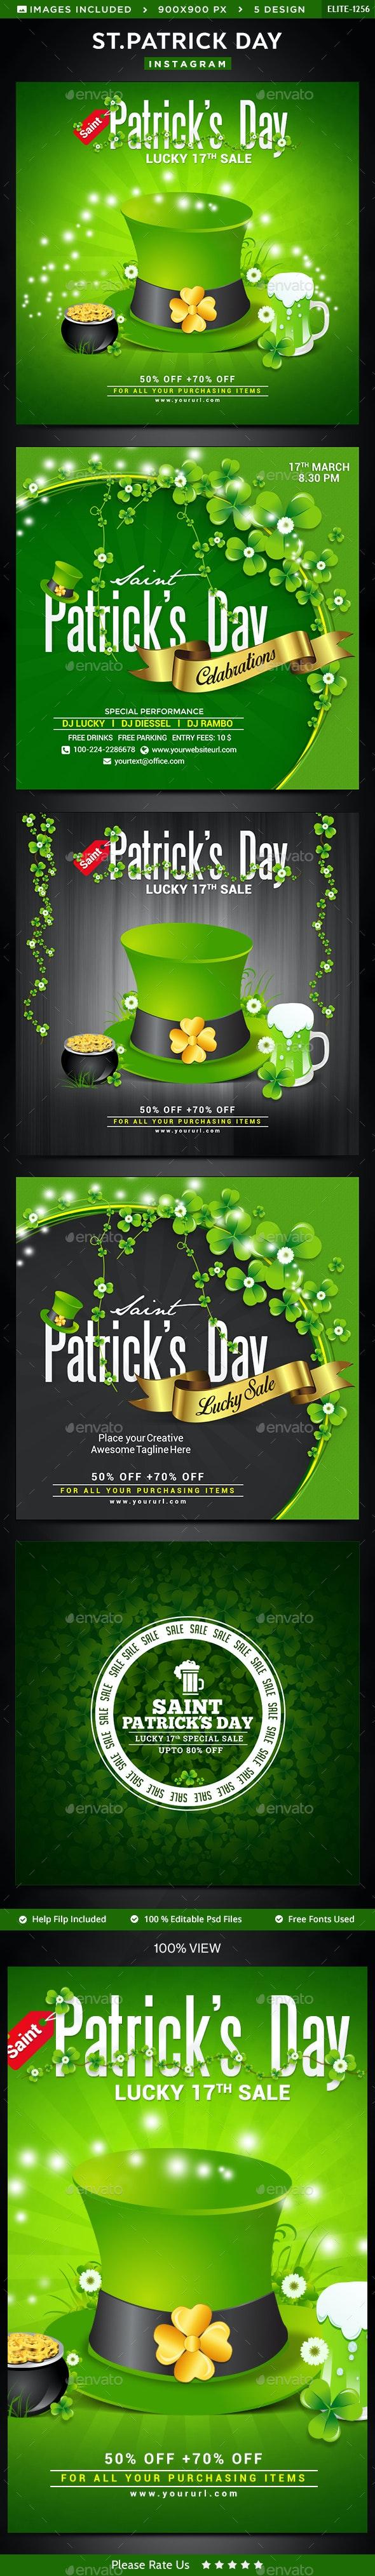 St.Patrick's Day Instagram Template - 5 Designs - Social Media Web Elements